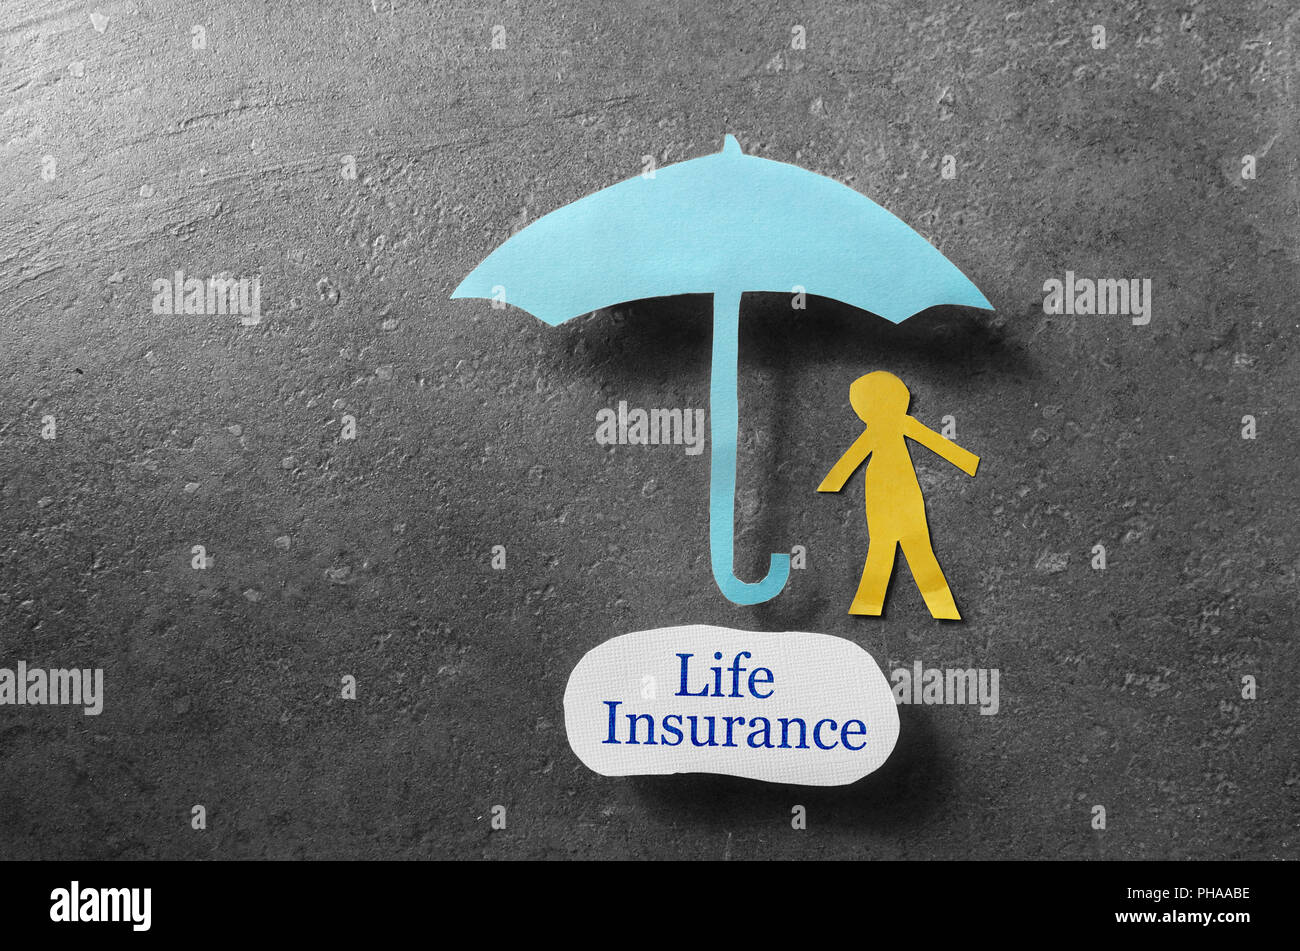 Life Insurance coverage - Stock Image